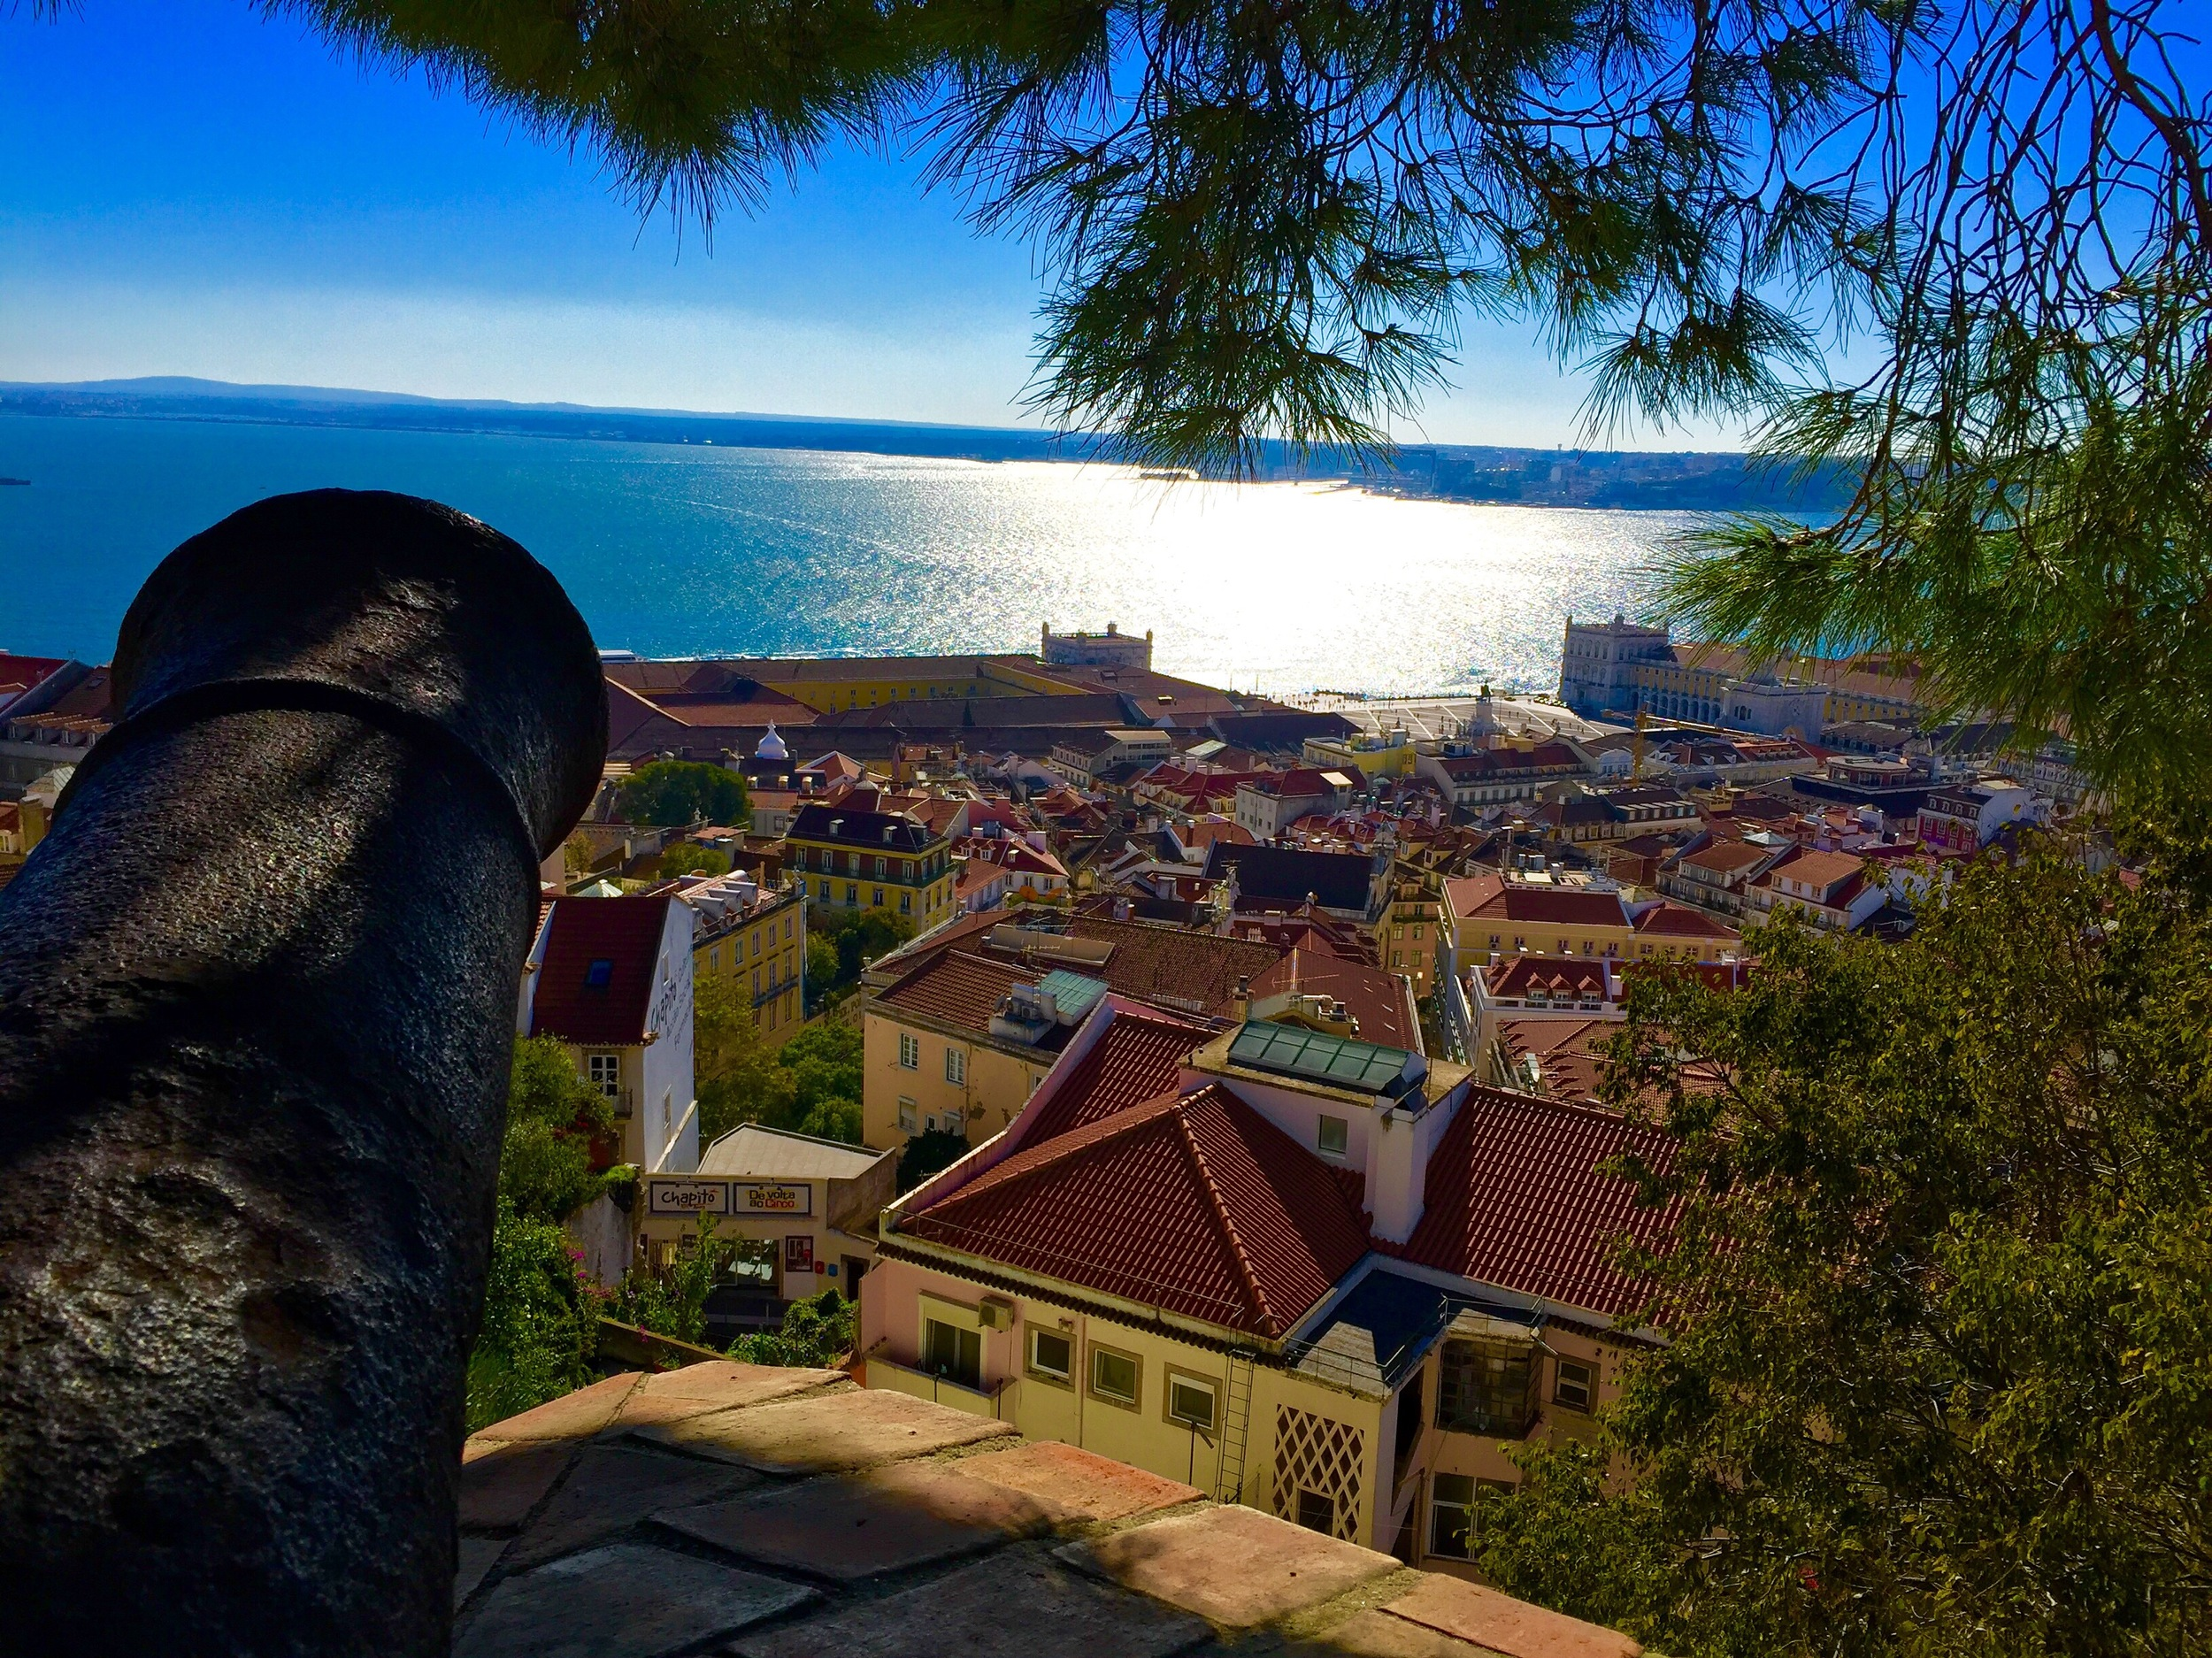 View from Castelo de S. Jorge